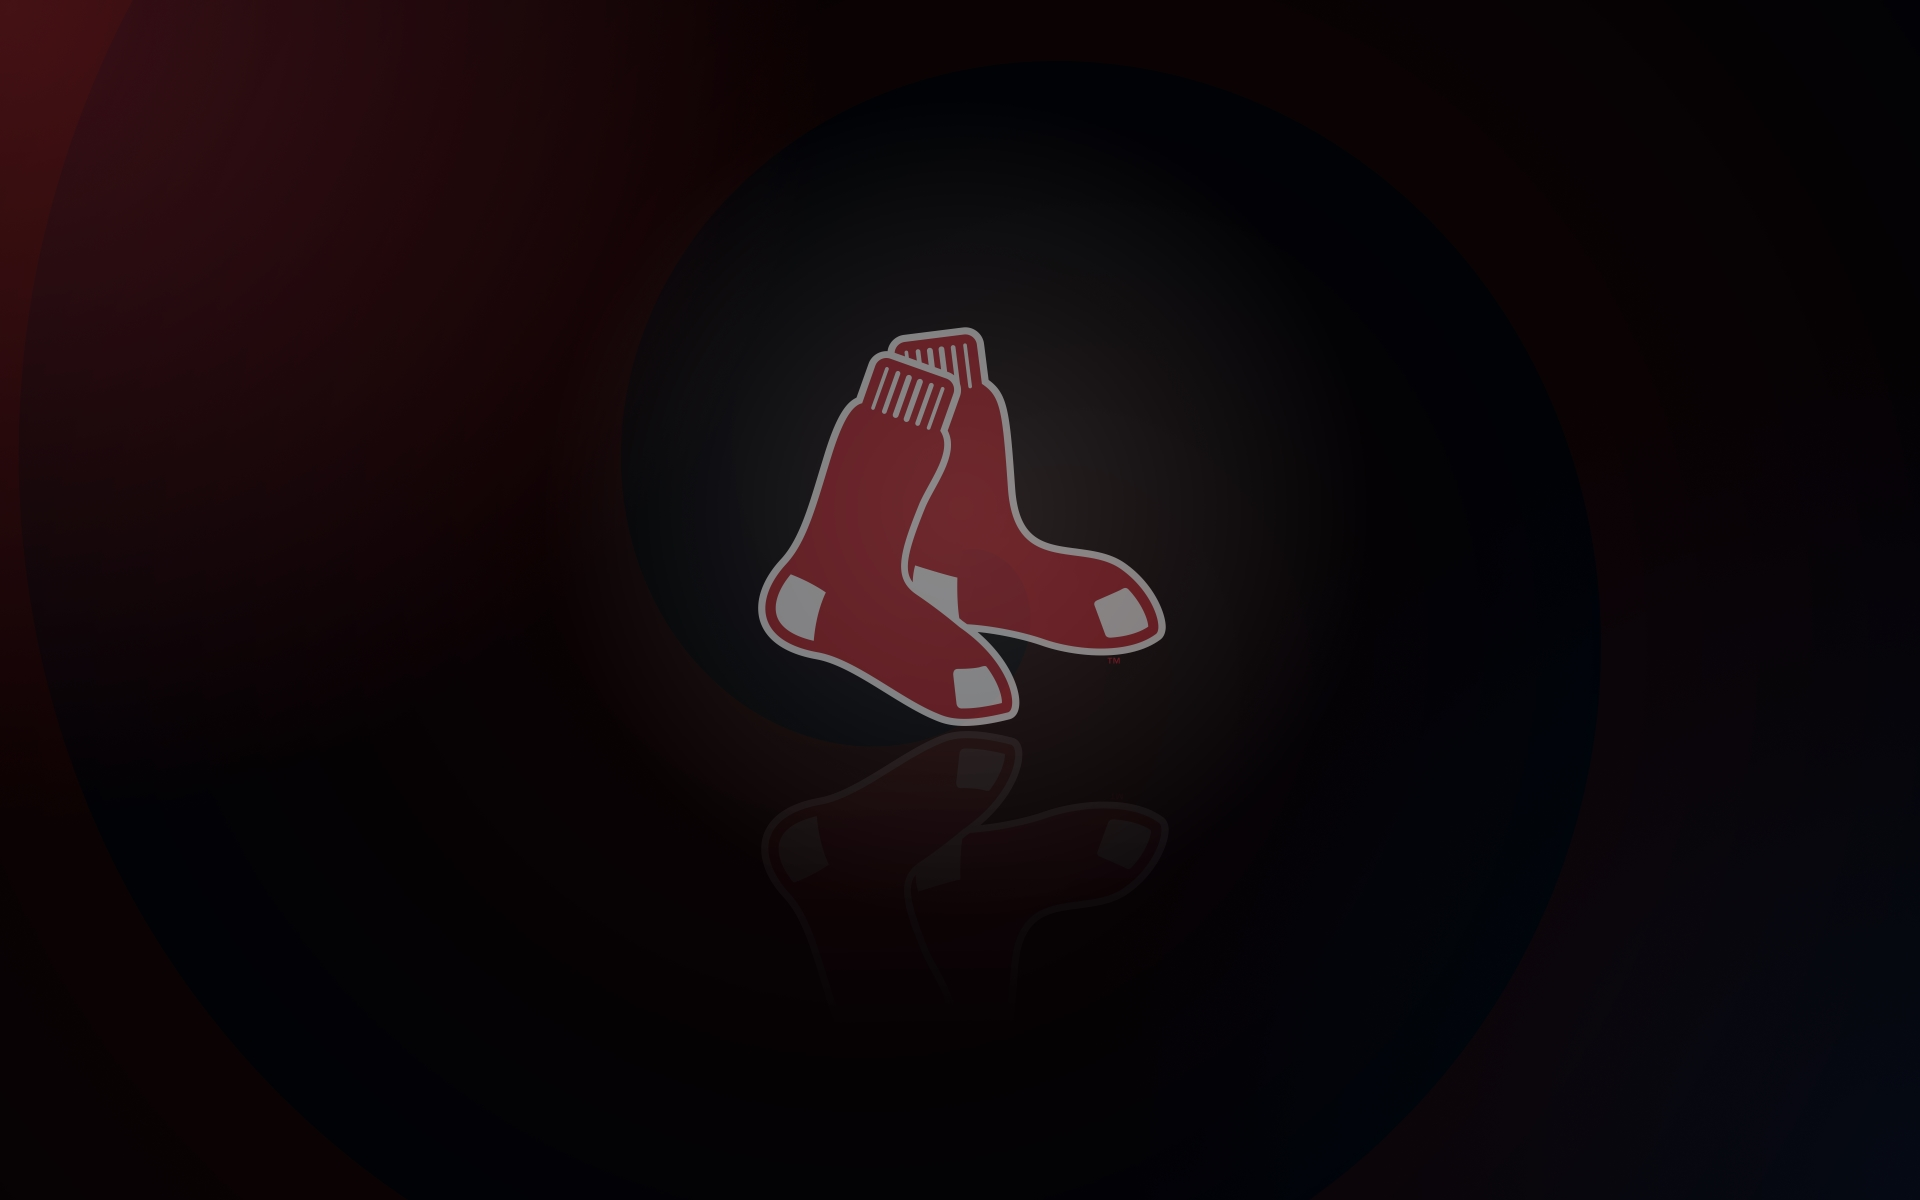 Boston Red Sox Wallpaper 12   1920 X 1200 stmednet 1920x1200